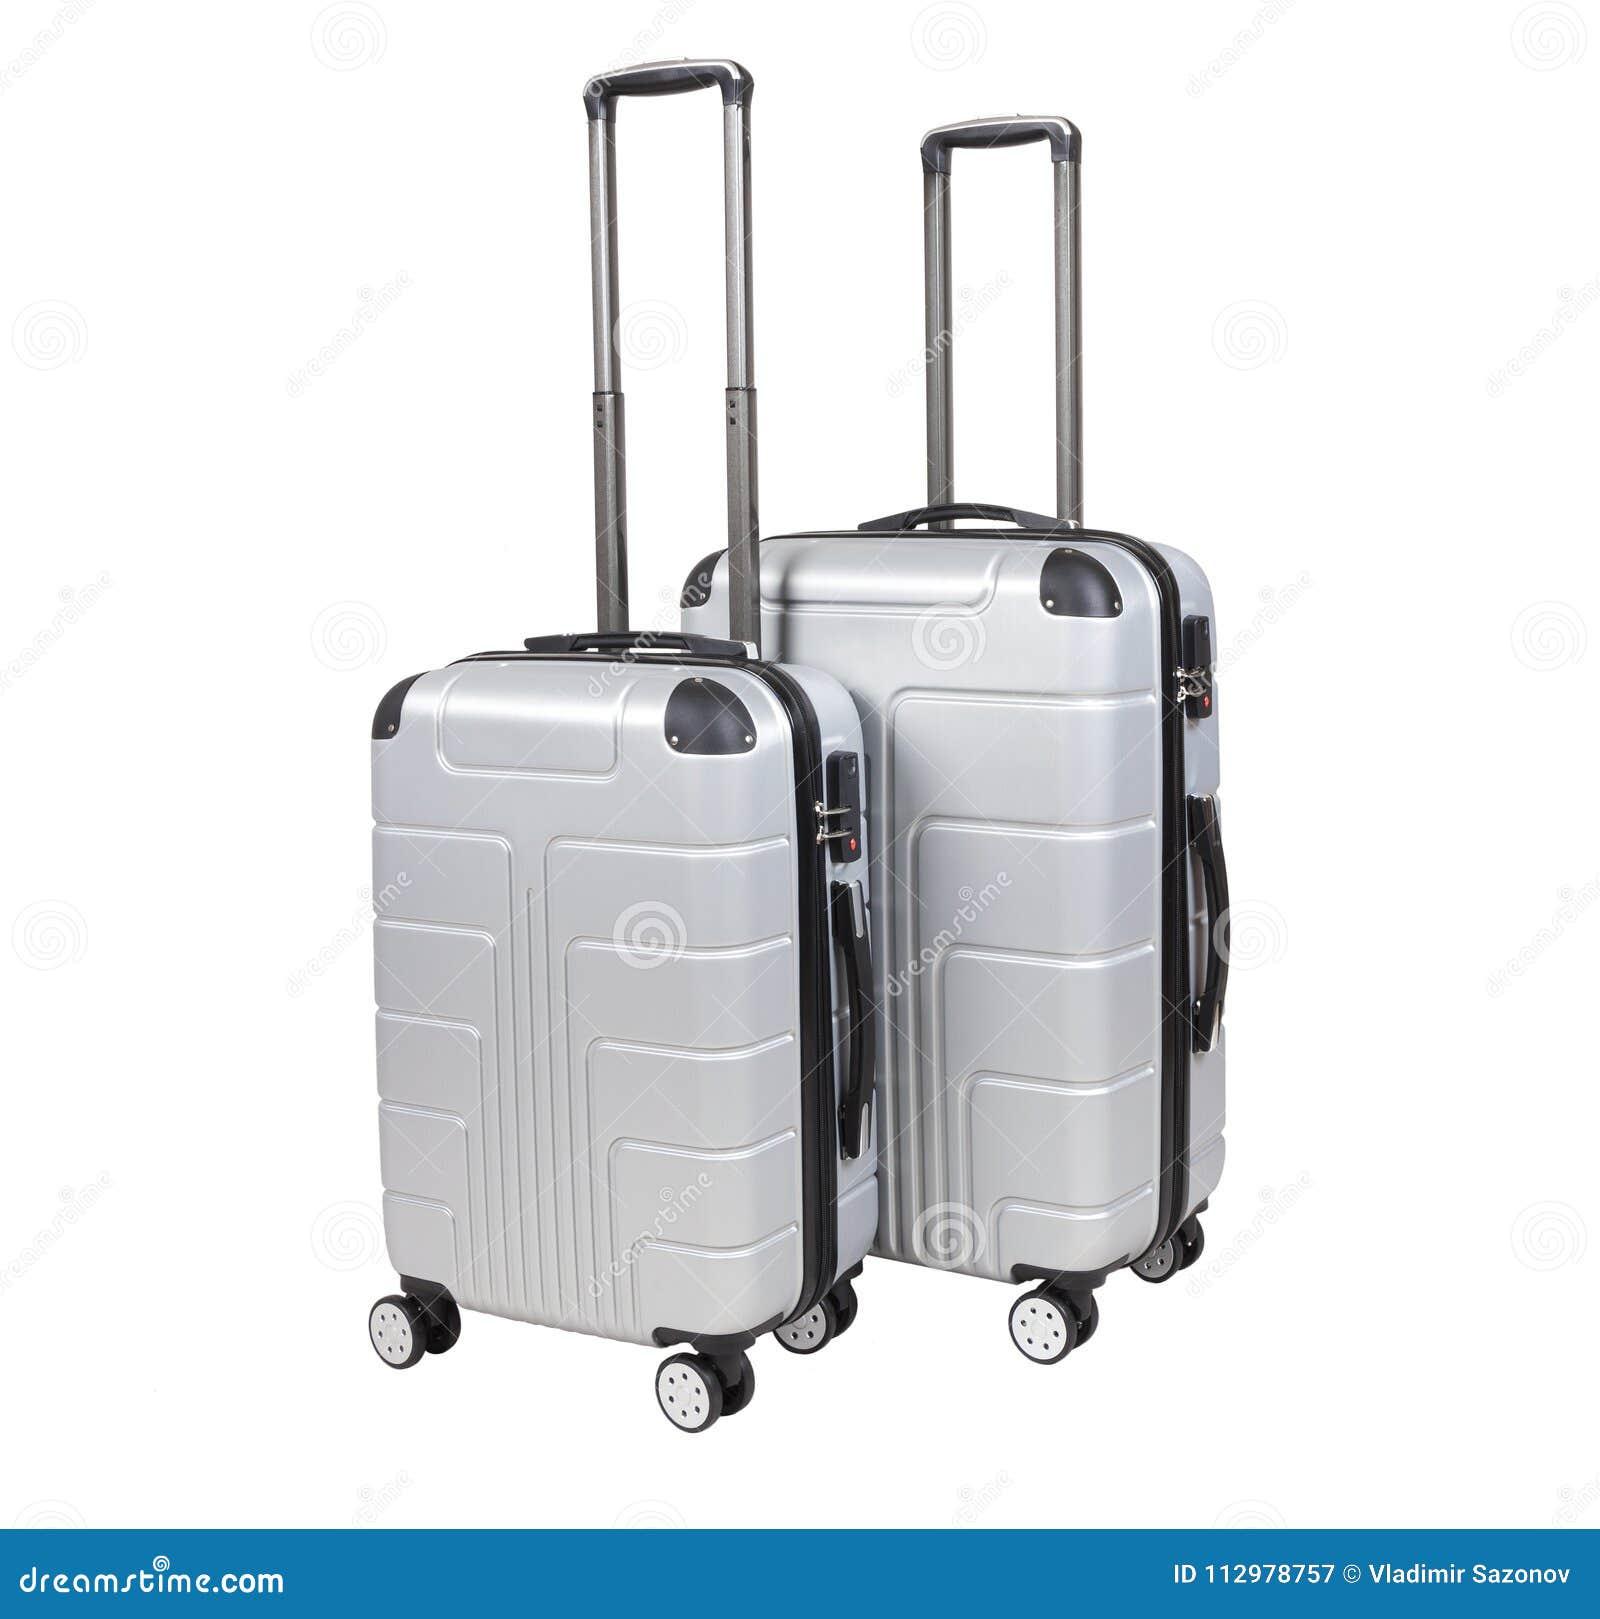 Gray suitcase isolated on white background.